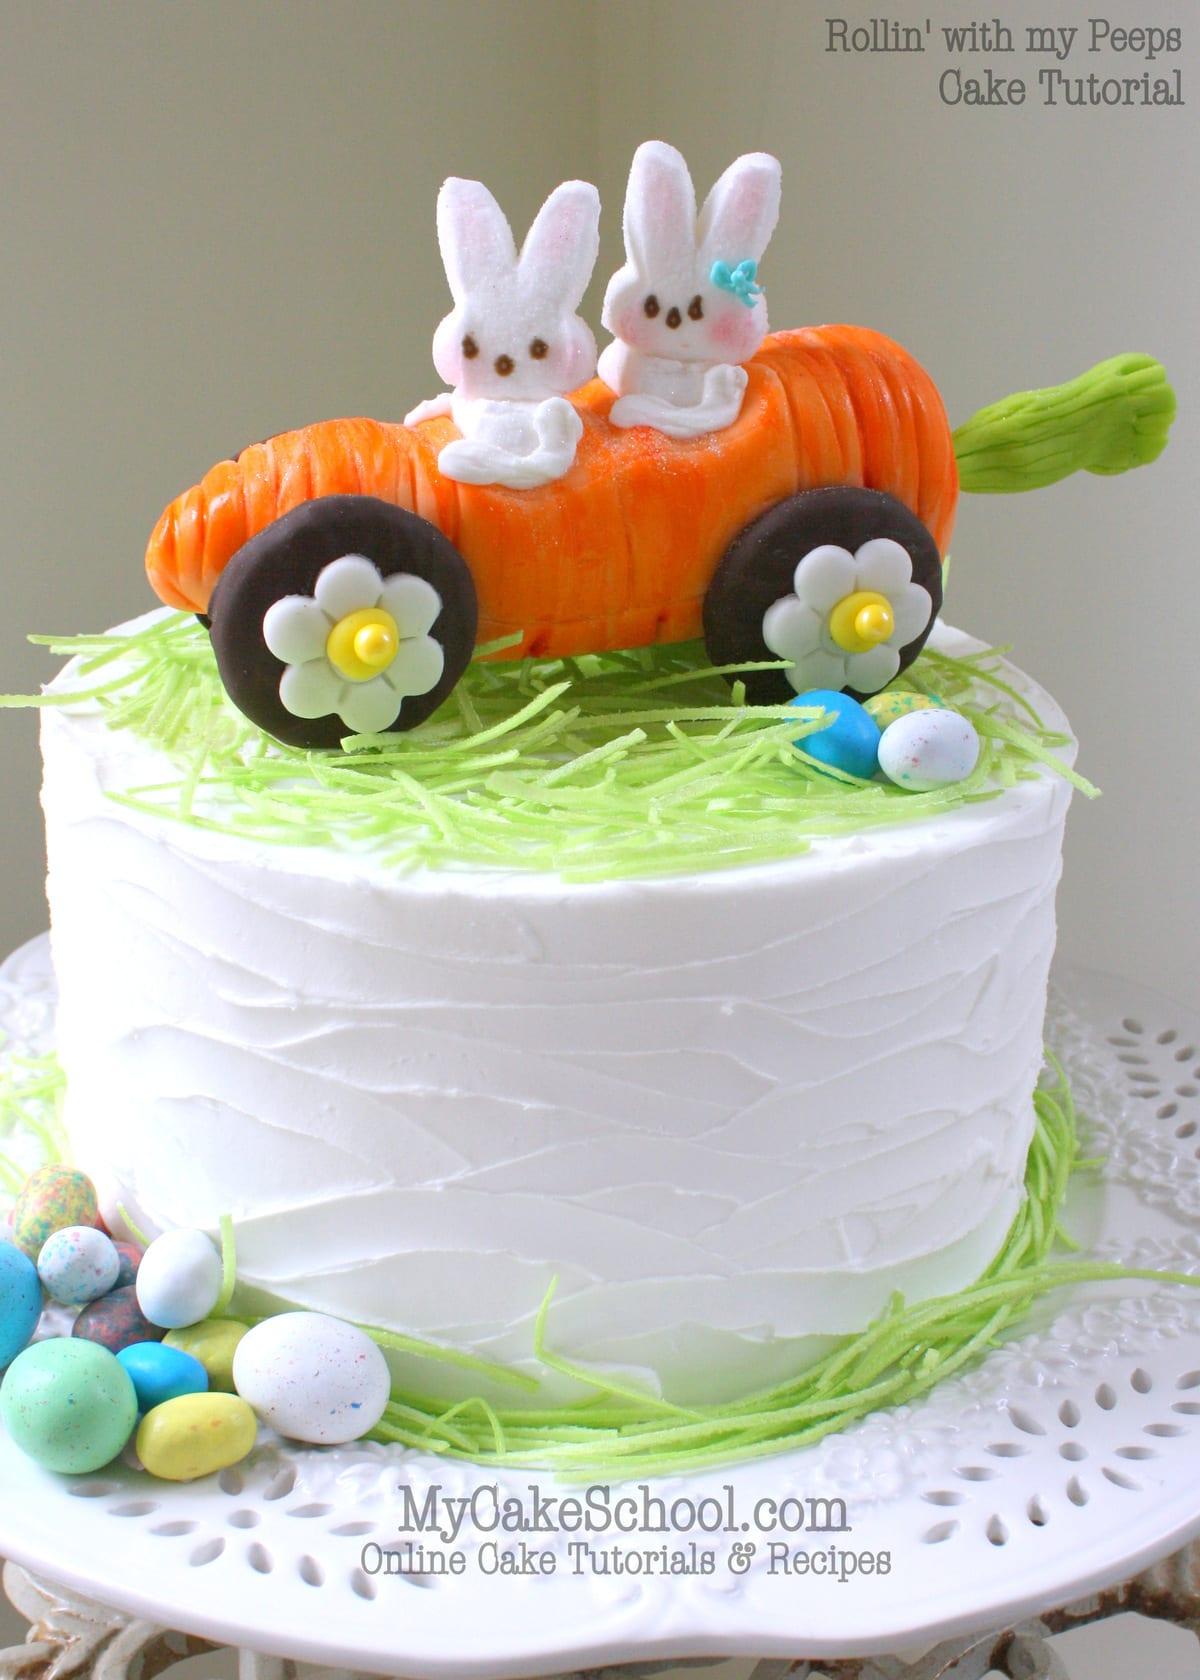 Cake Decorating Classes For Fun